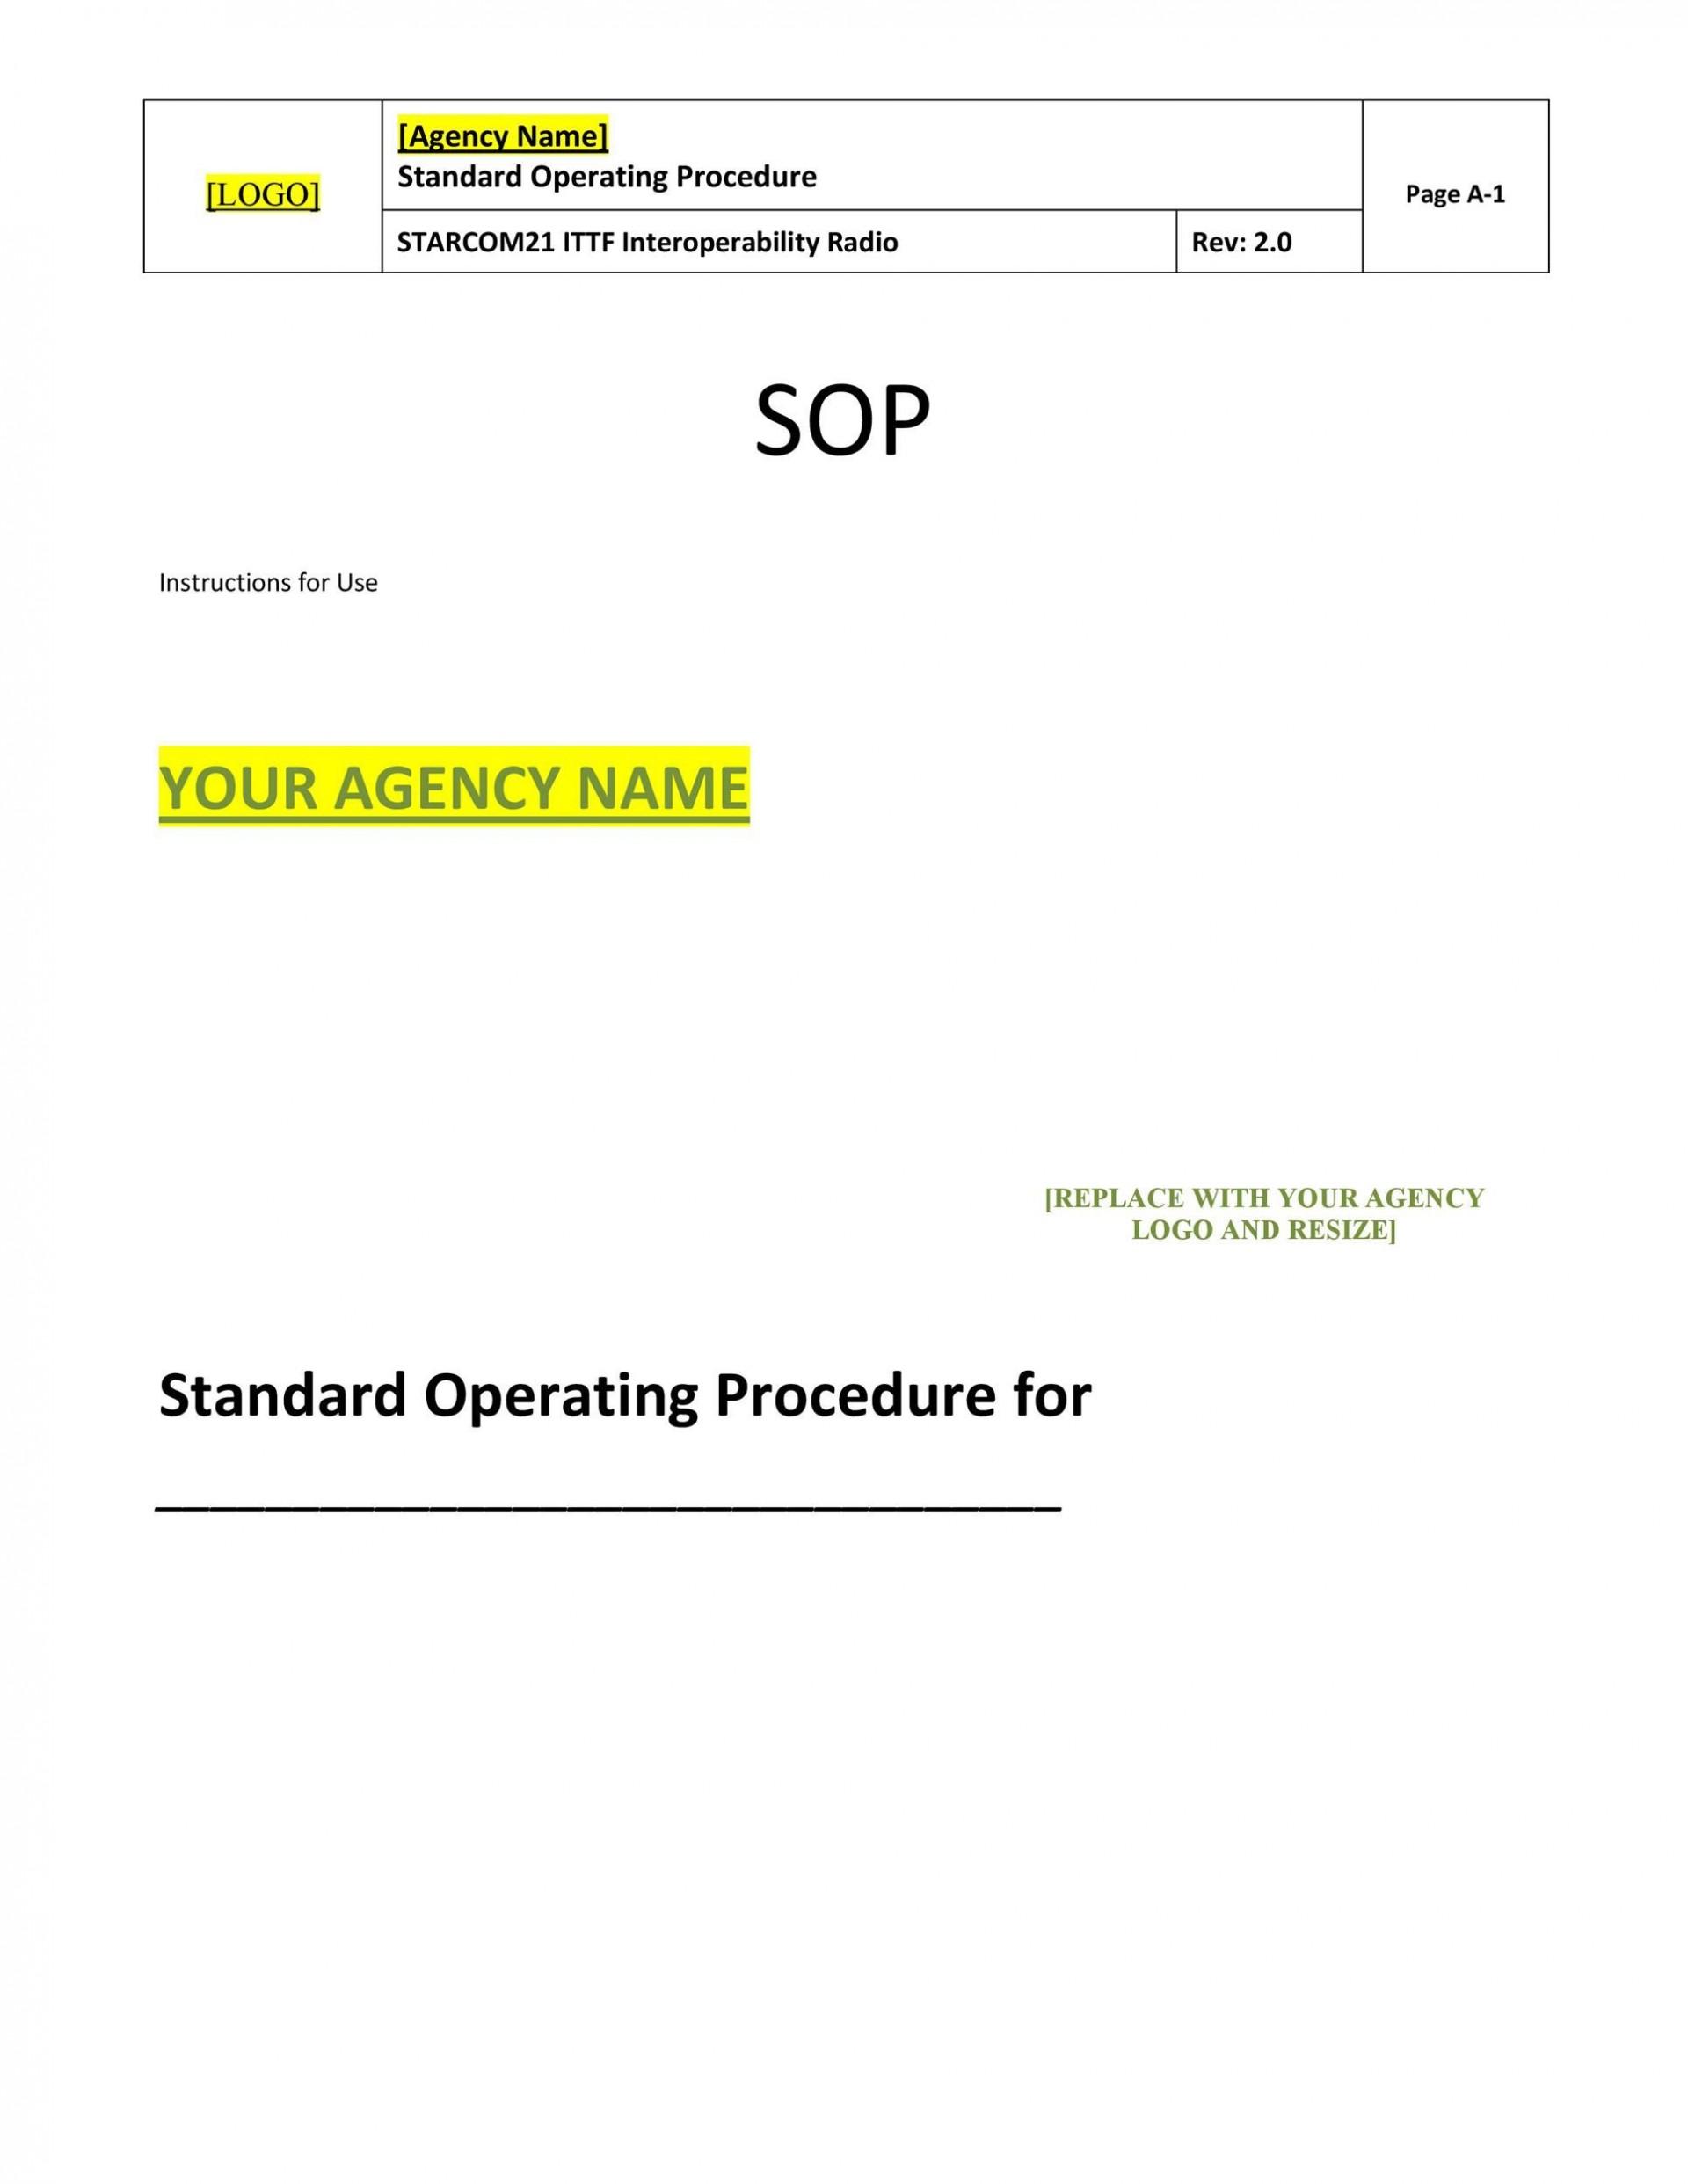 Free Standard Operating Procedure Template Word 21 Within Free Standard Operating Procedure Template Word 2010